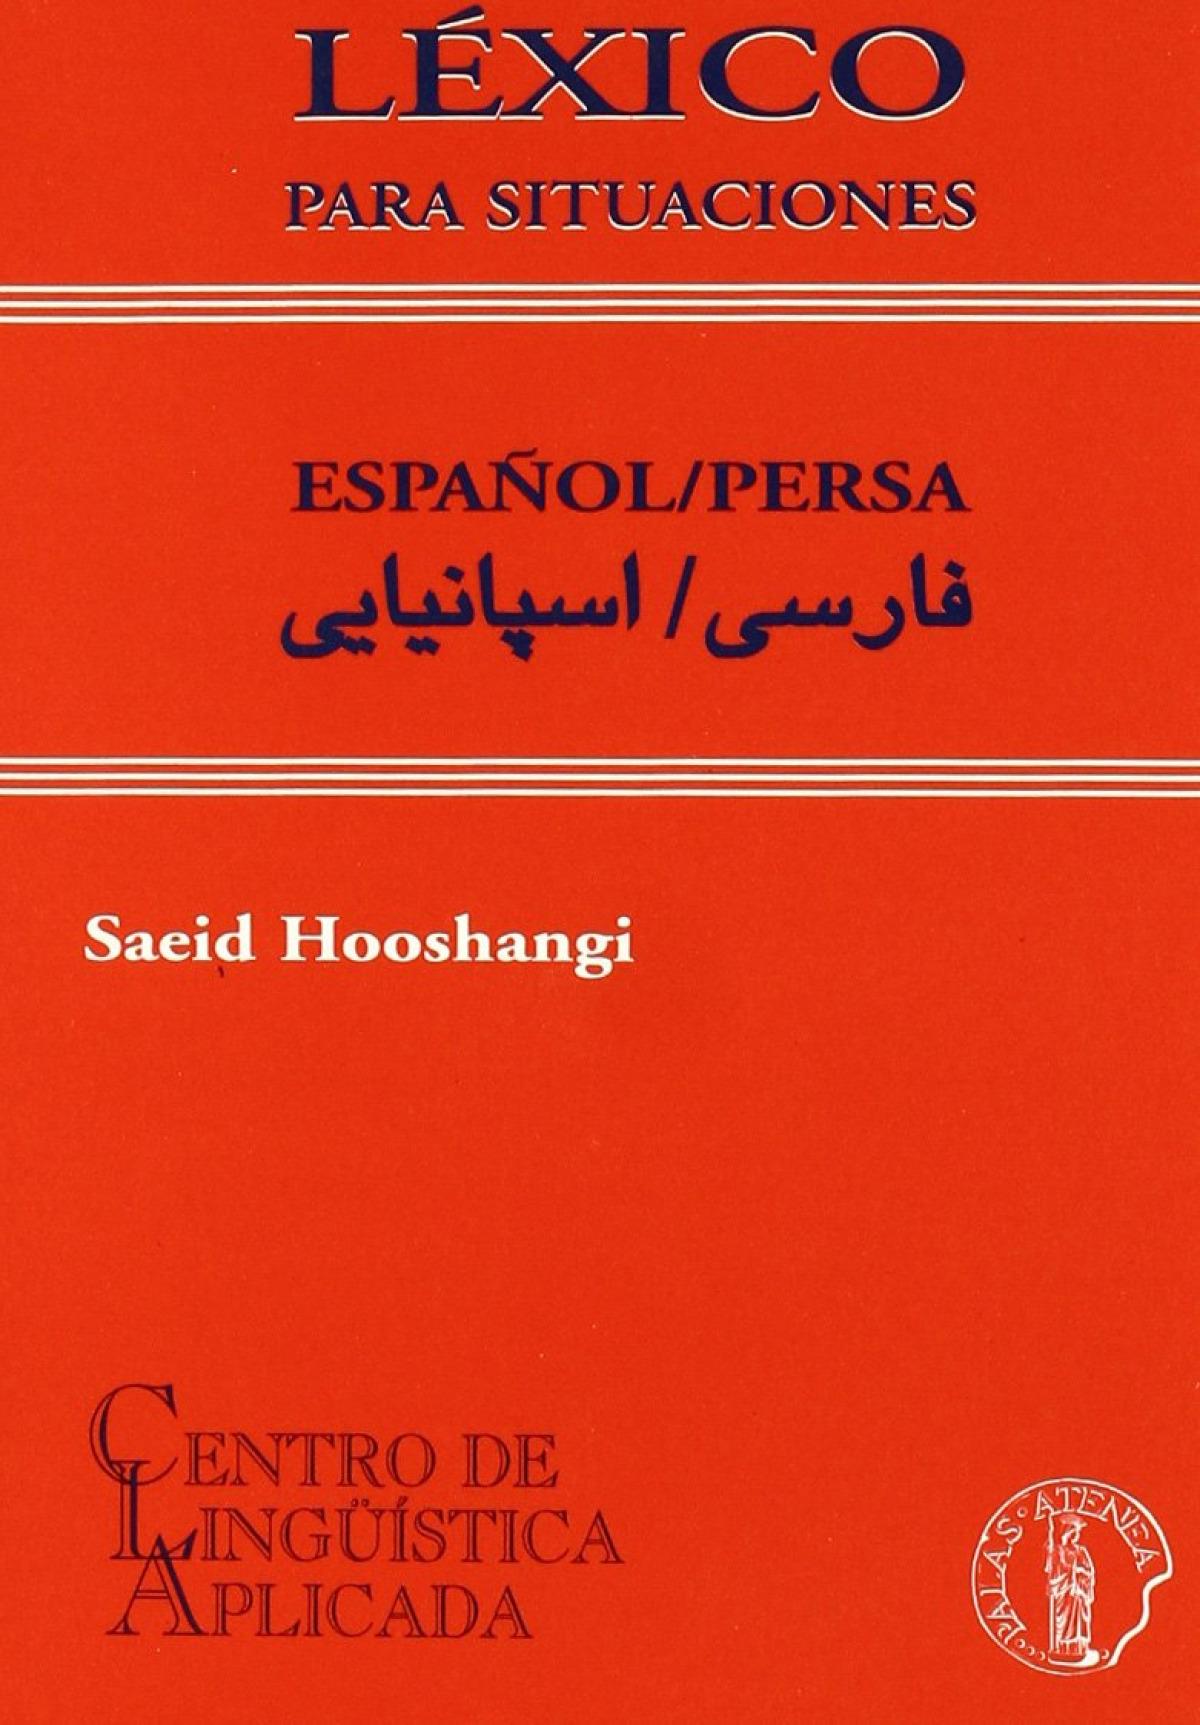 Lexico para situaciones español/persa vv 9788495855404